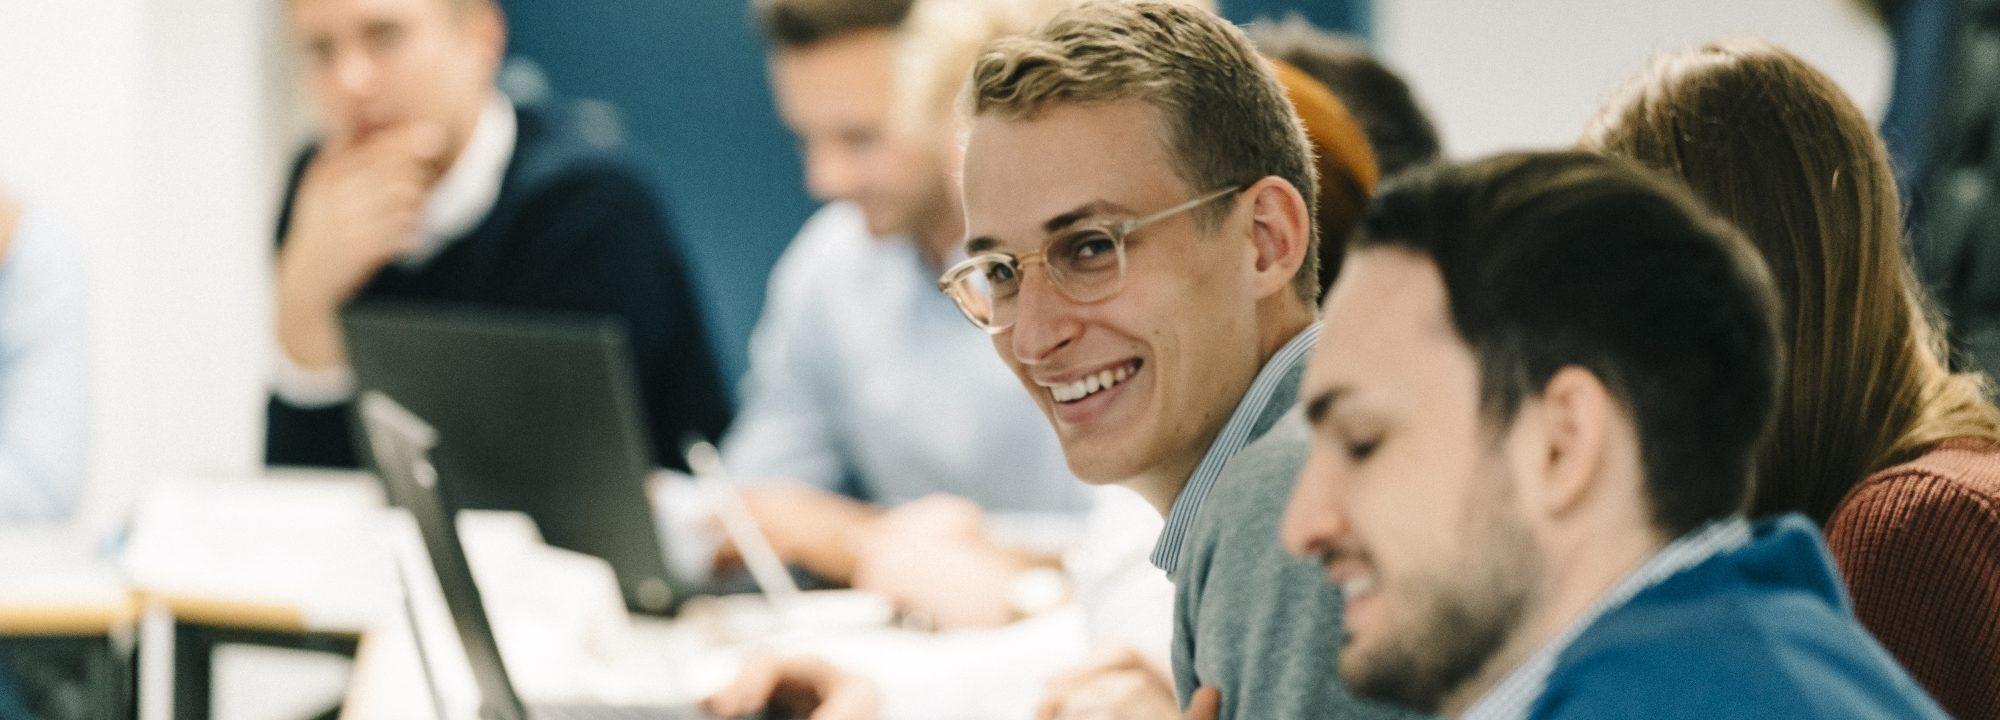 CCG - HHL Leipzig Graduate School of Management